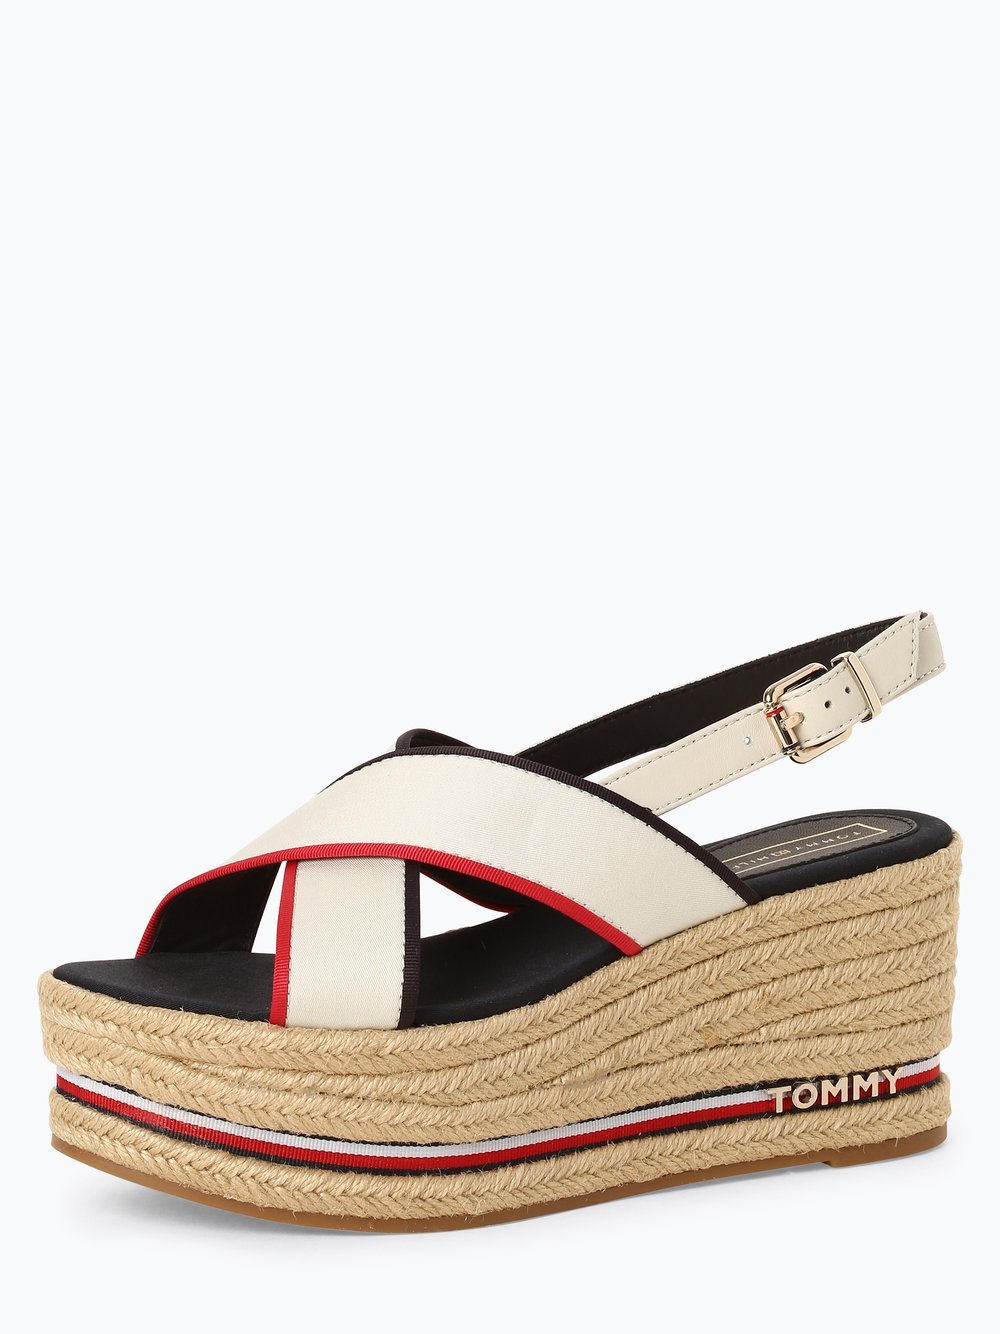 Damen Sandaletten mit Leder Anteil